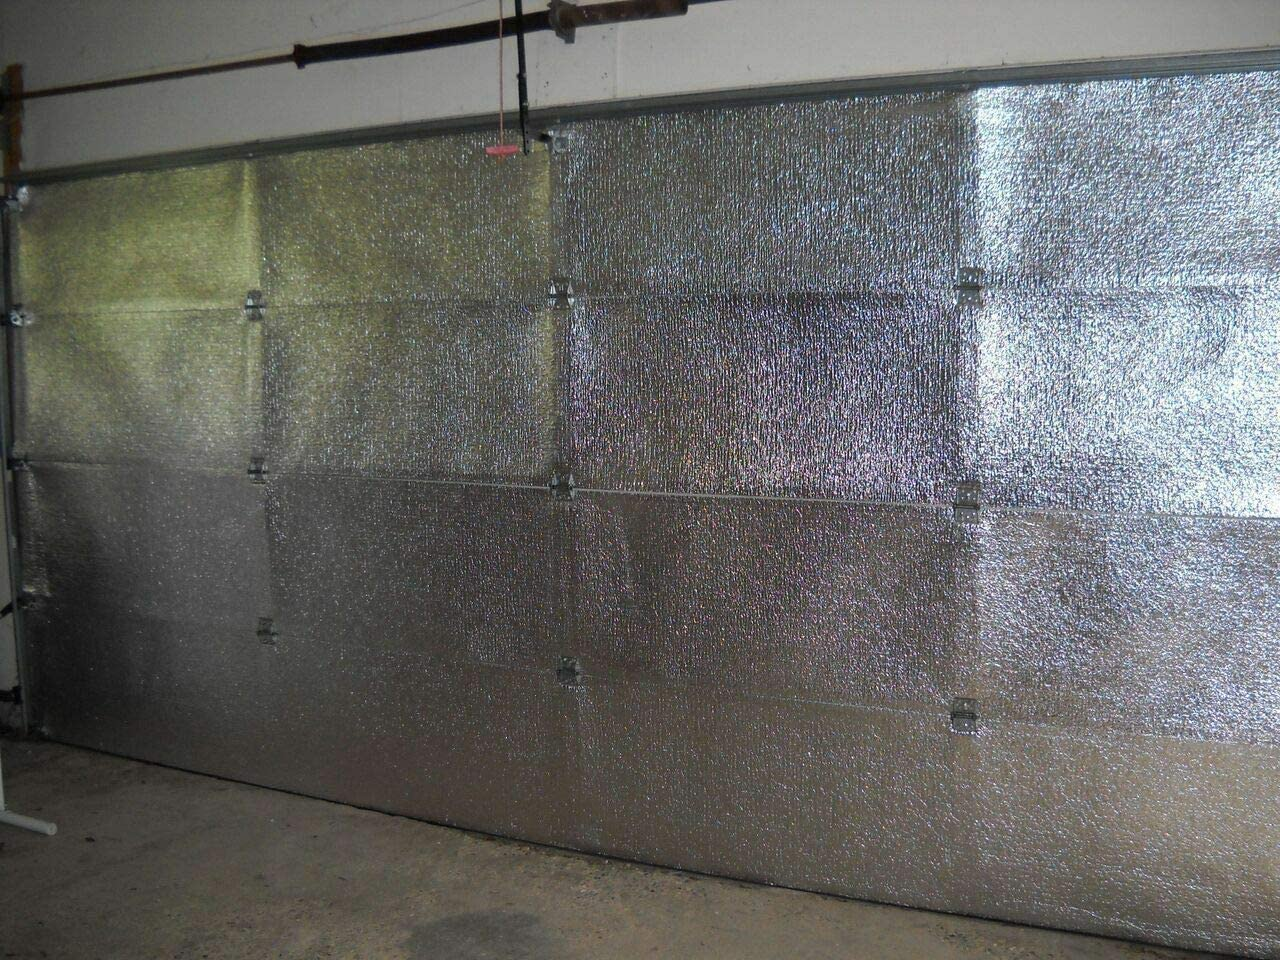 Reflective Garage Door Insulation Kit Philadelphia Mall 17 R8 8 x Feet W 5% OFF H